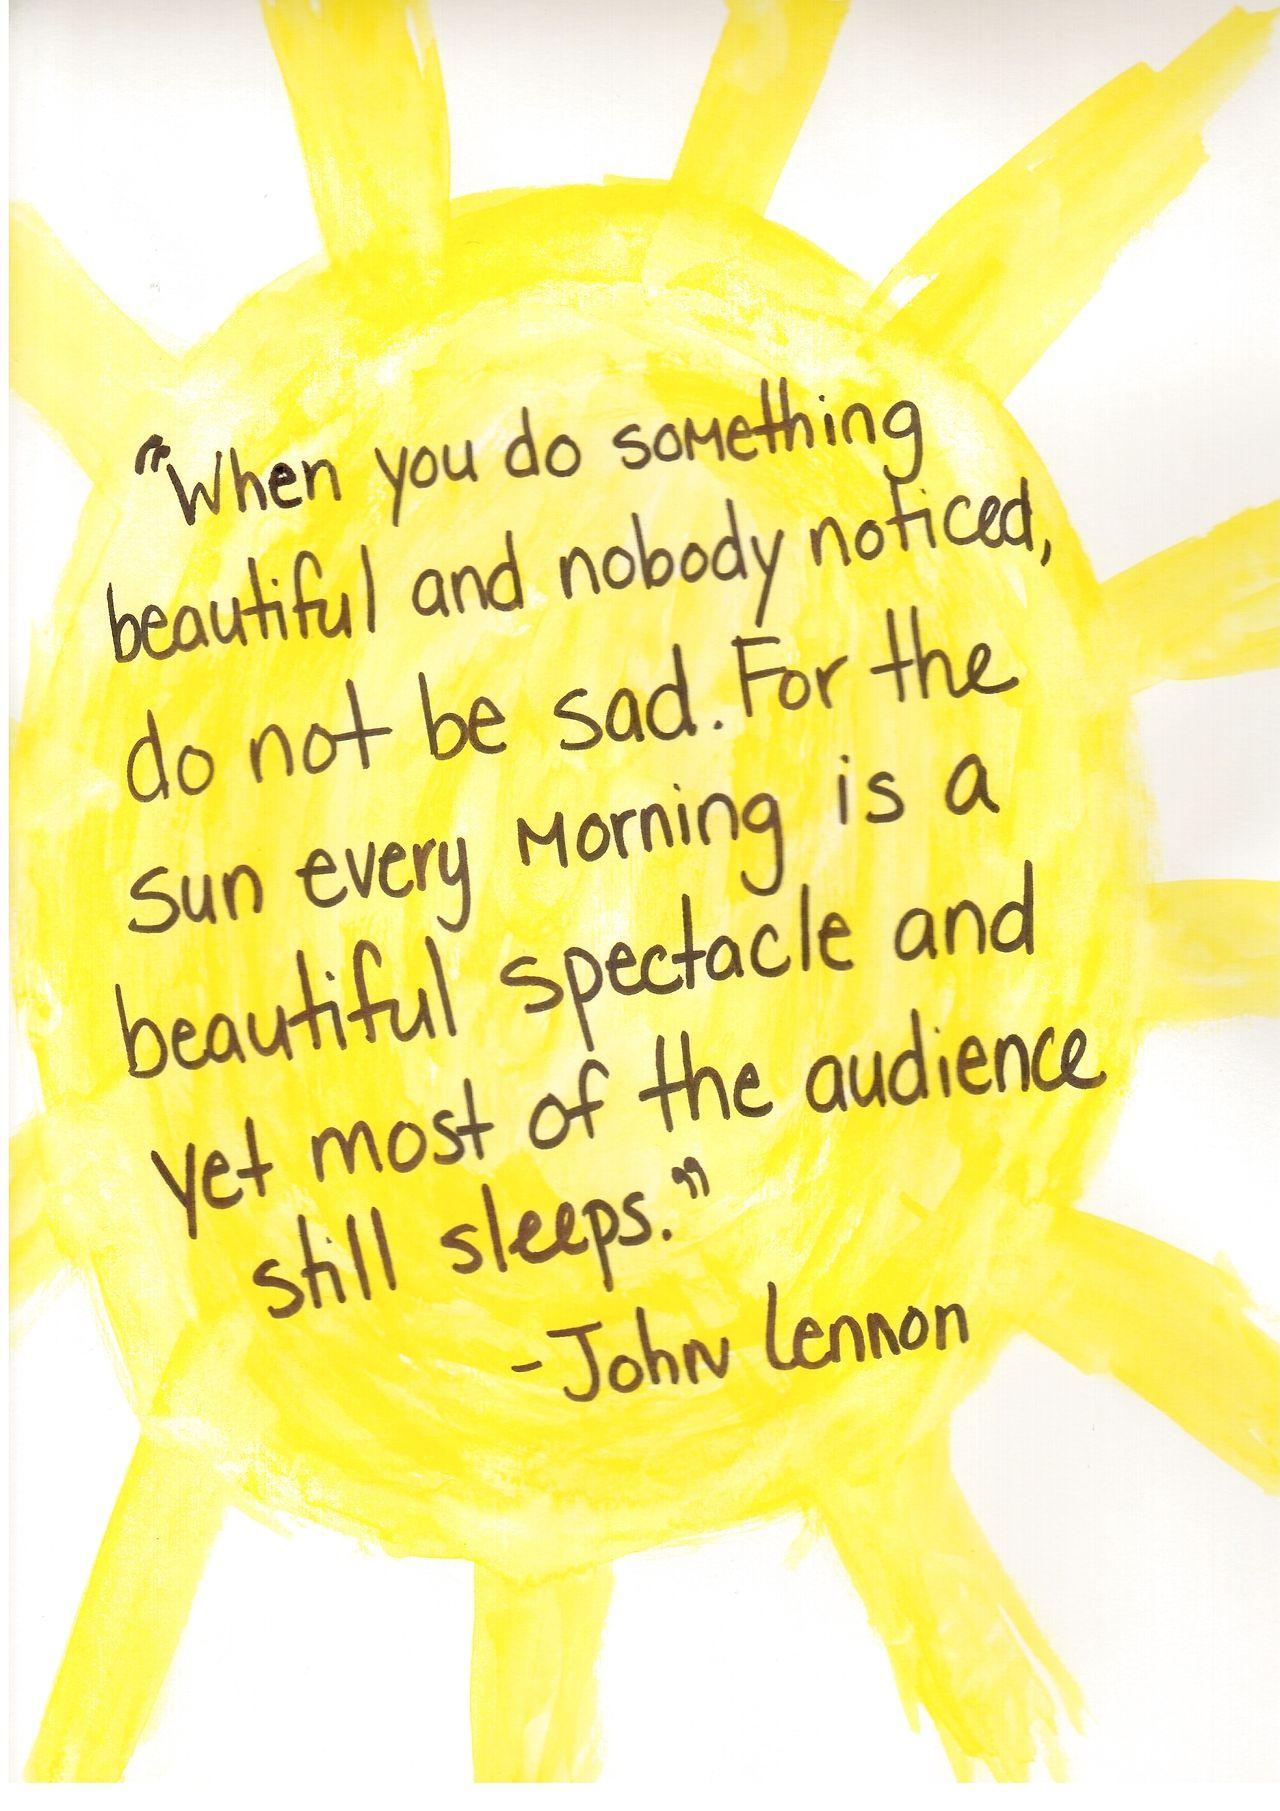 When you do something beautiful and nobody noticed, do not be sad... -John Lennon